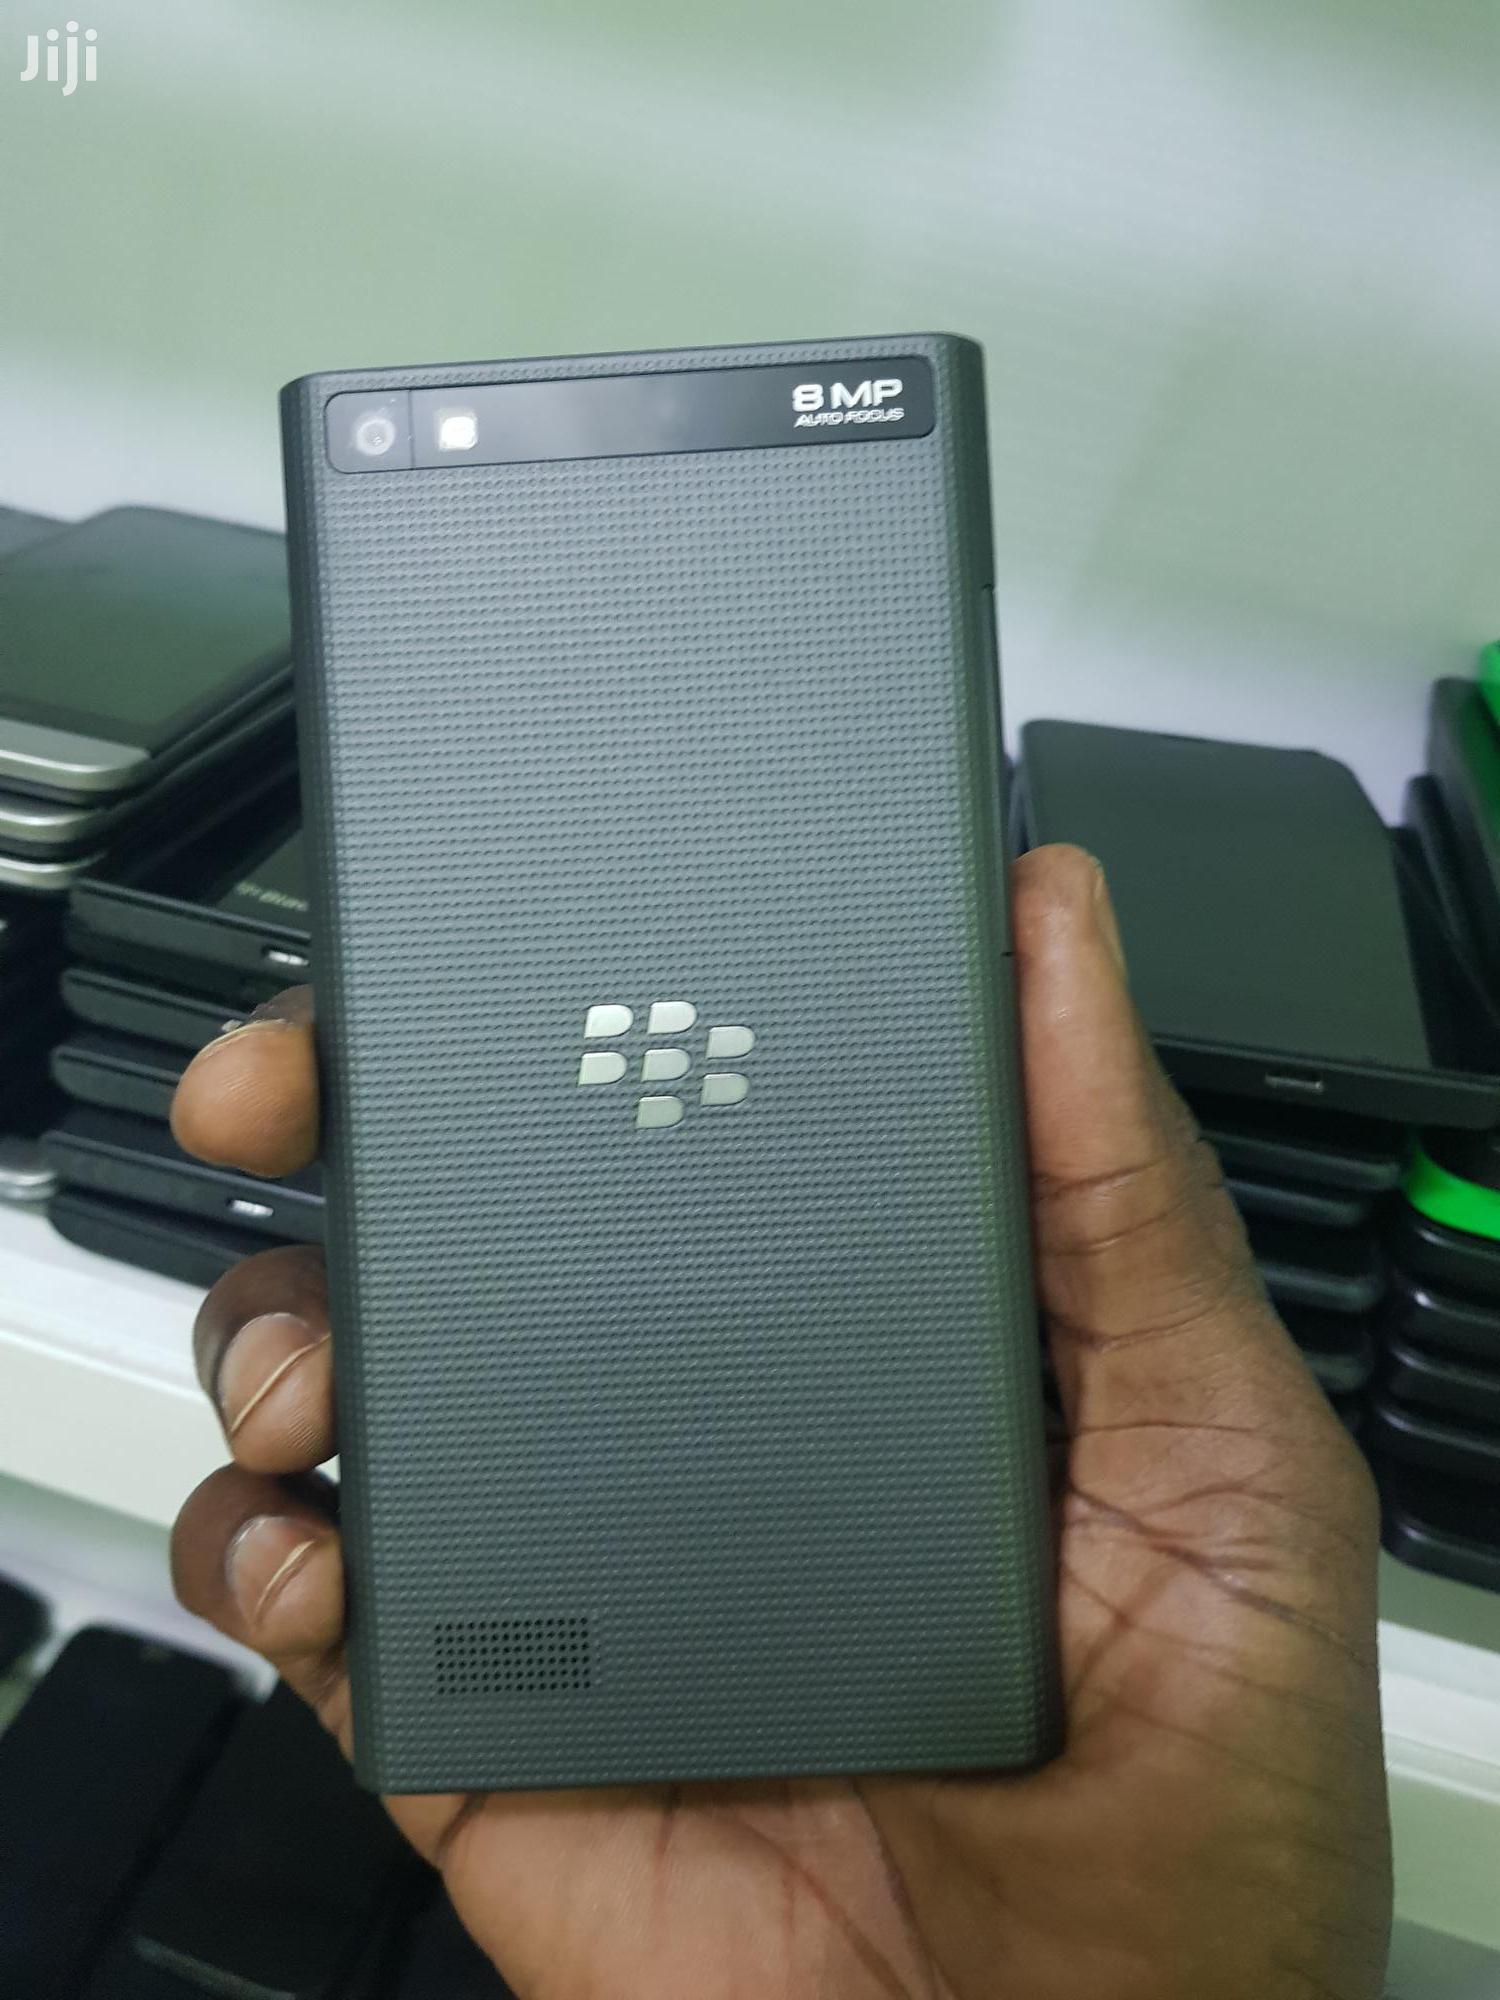 Blackberry Leap Black 16 GB | Mobile Phones for sale in Ikeja, Lagos State, Nigeria